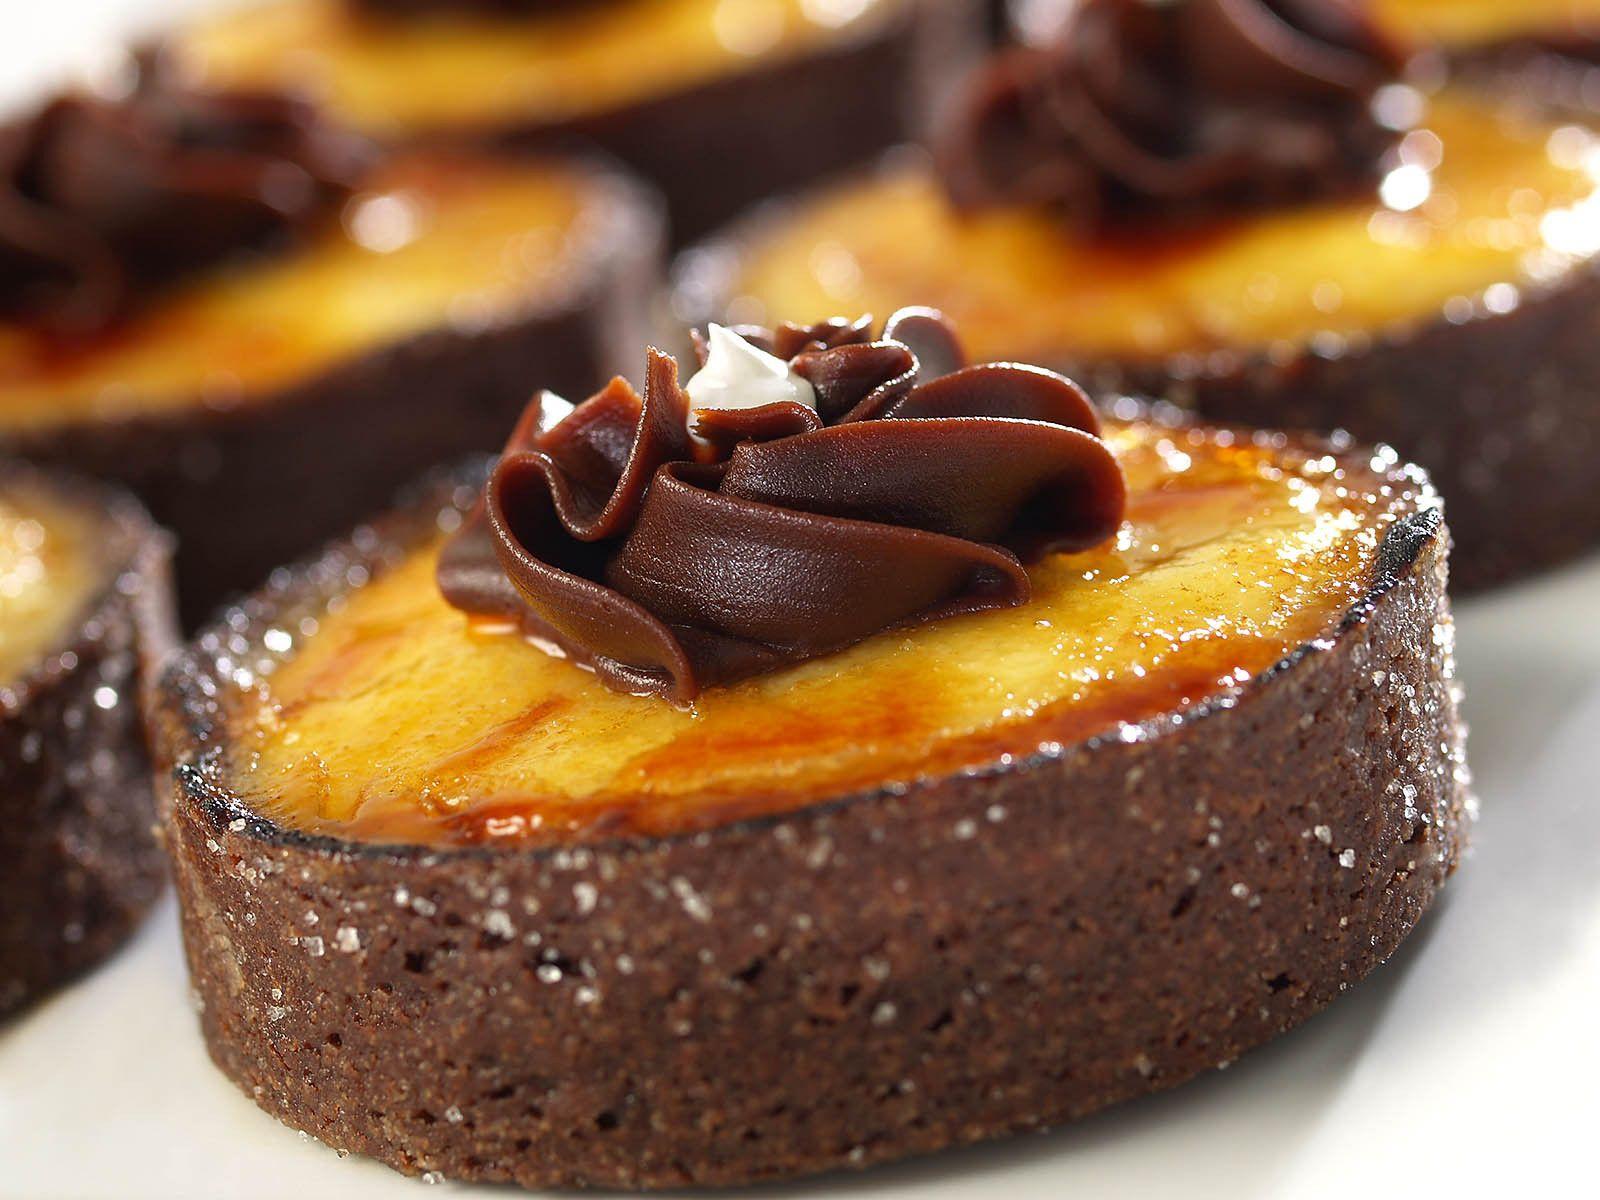 Lou-Manna-Chocolate-Creme-Brulee-Tart